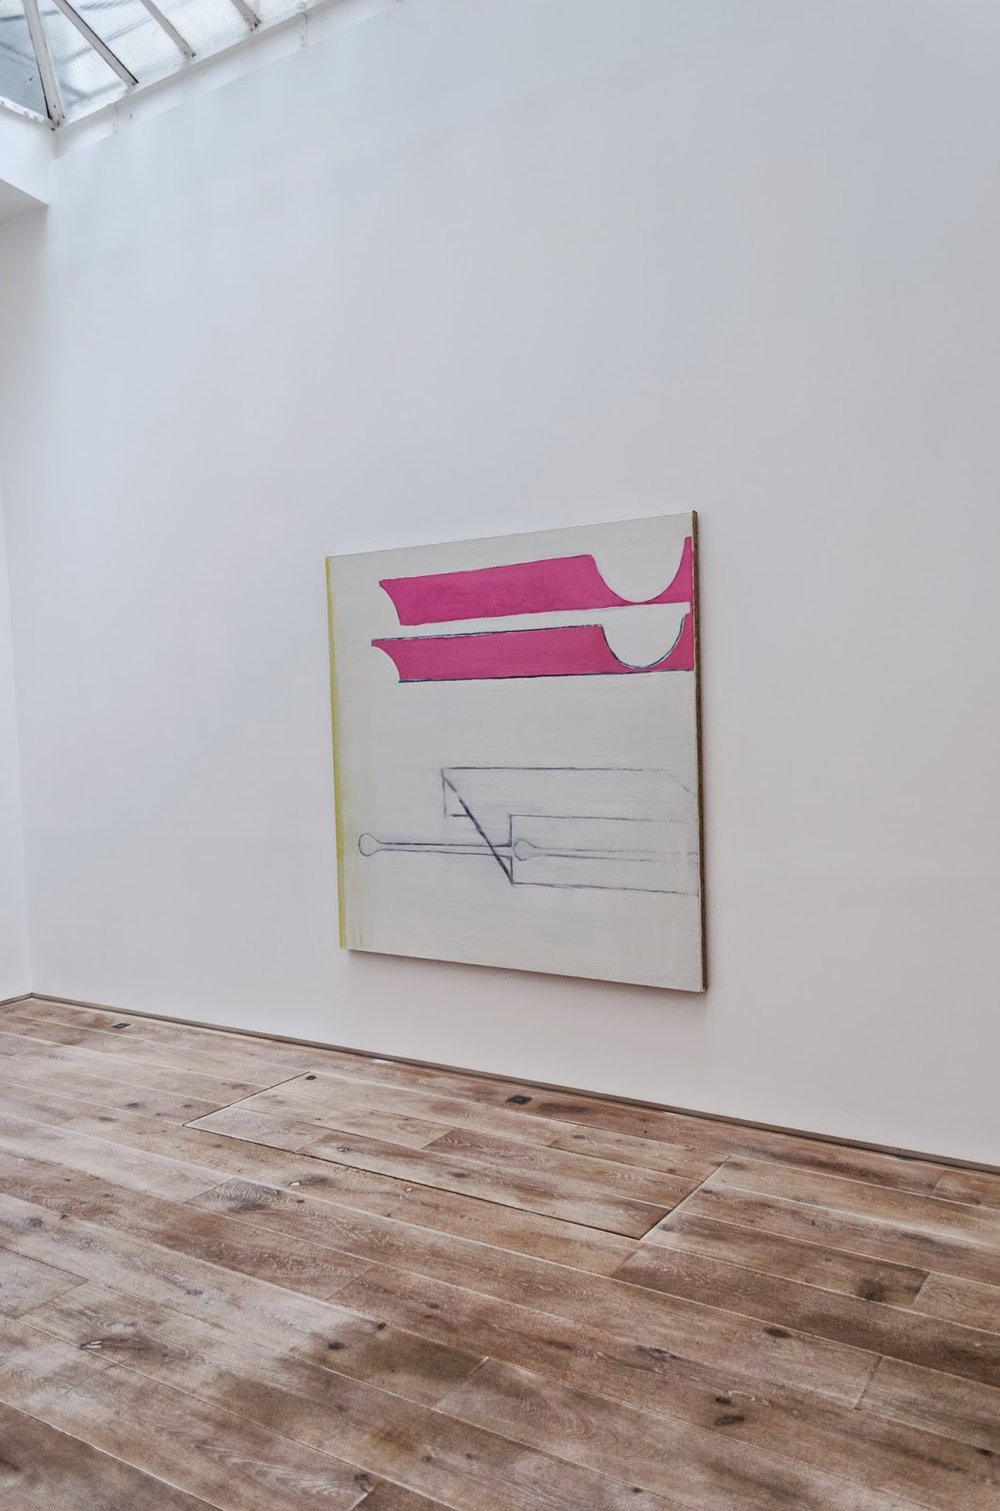 Galerie Eric Dupont, Paris: Solo show, 2014